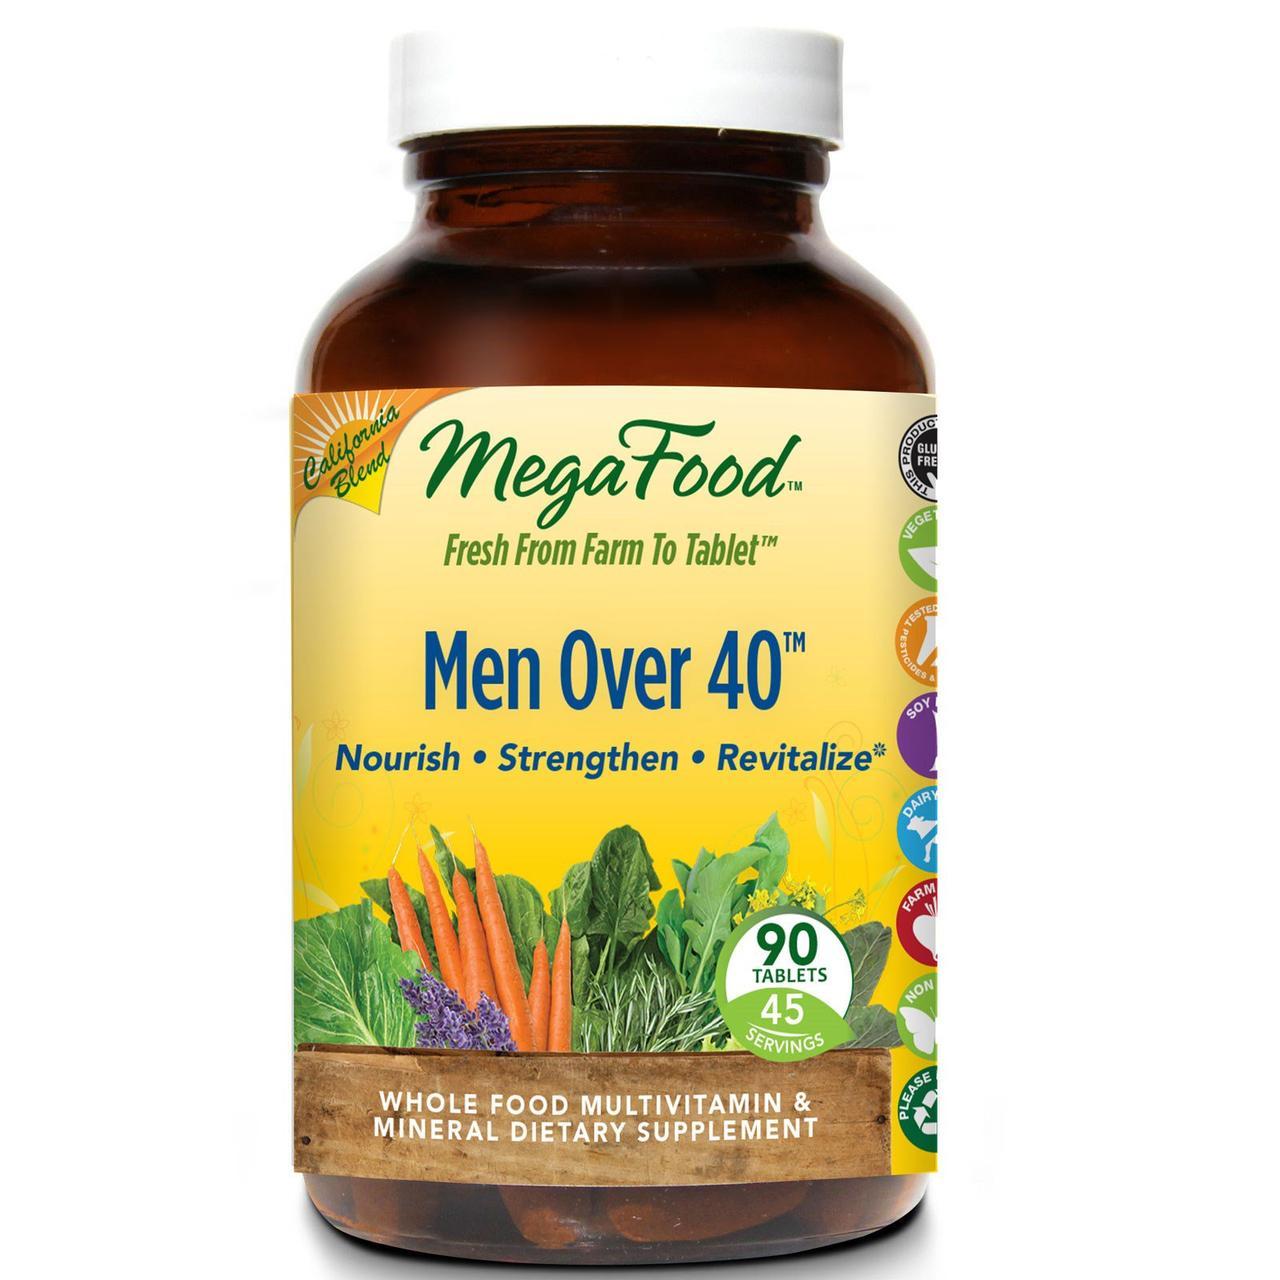 MegaFood, Men Over 40, Whole Food Multivitamin & Mineral, Iron Free Formula, 90 Tablets